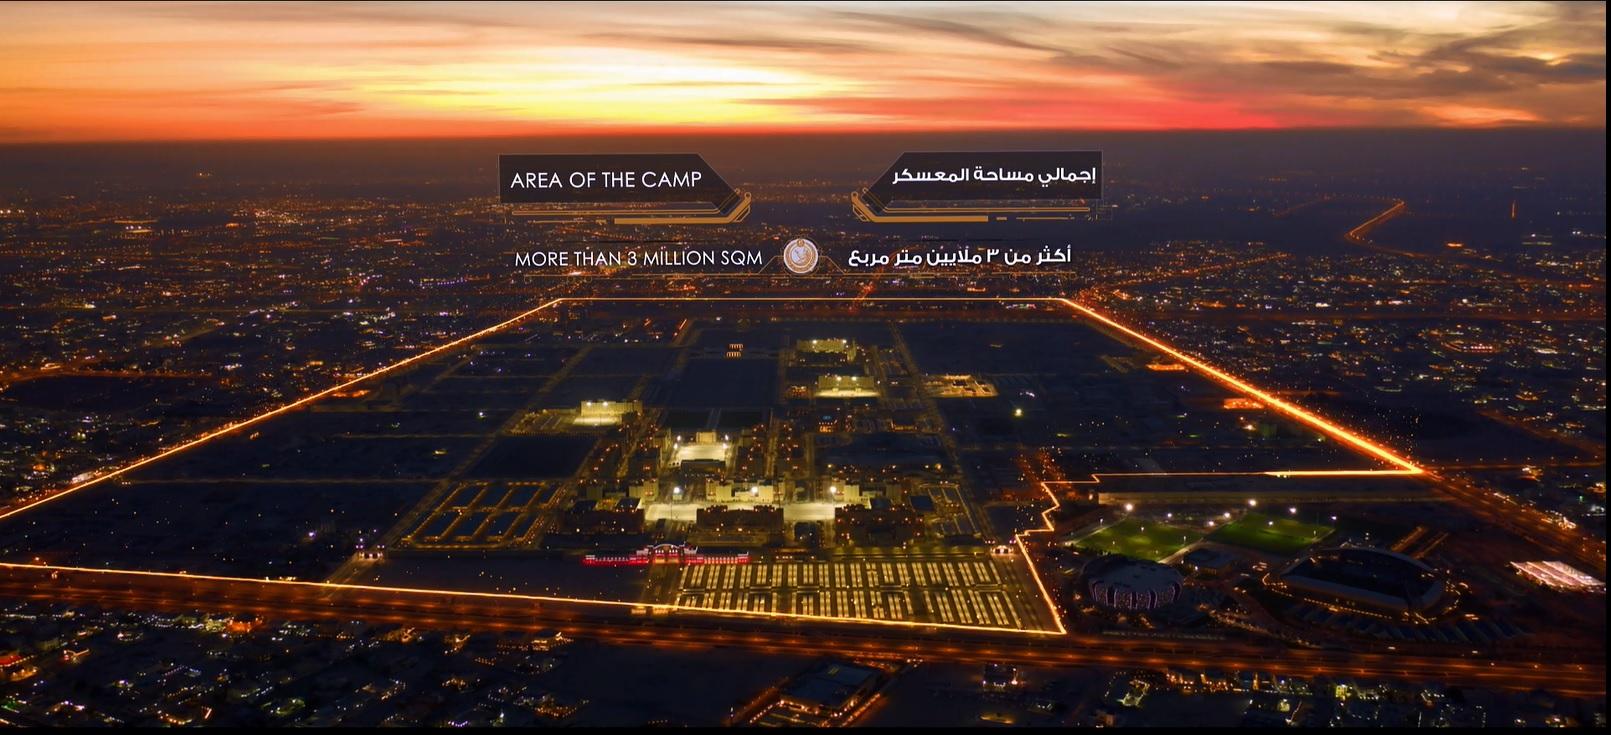 Lekhwiya Camp in Al Duhail Obtains Prestigious Sustainability Certificate